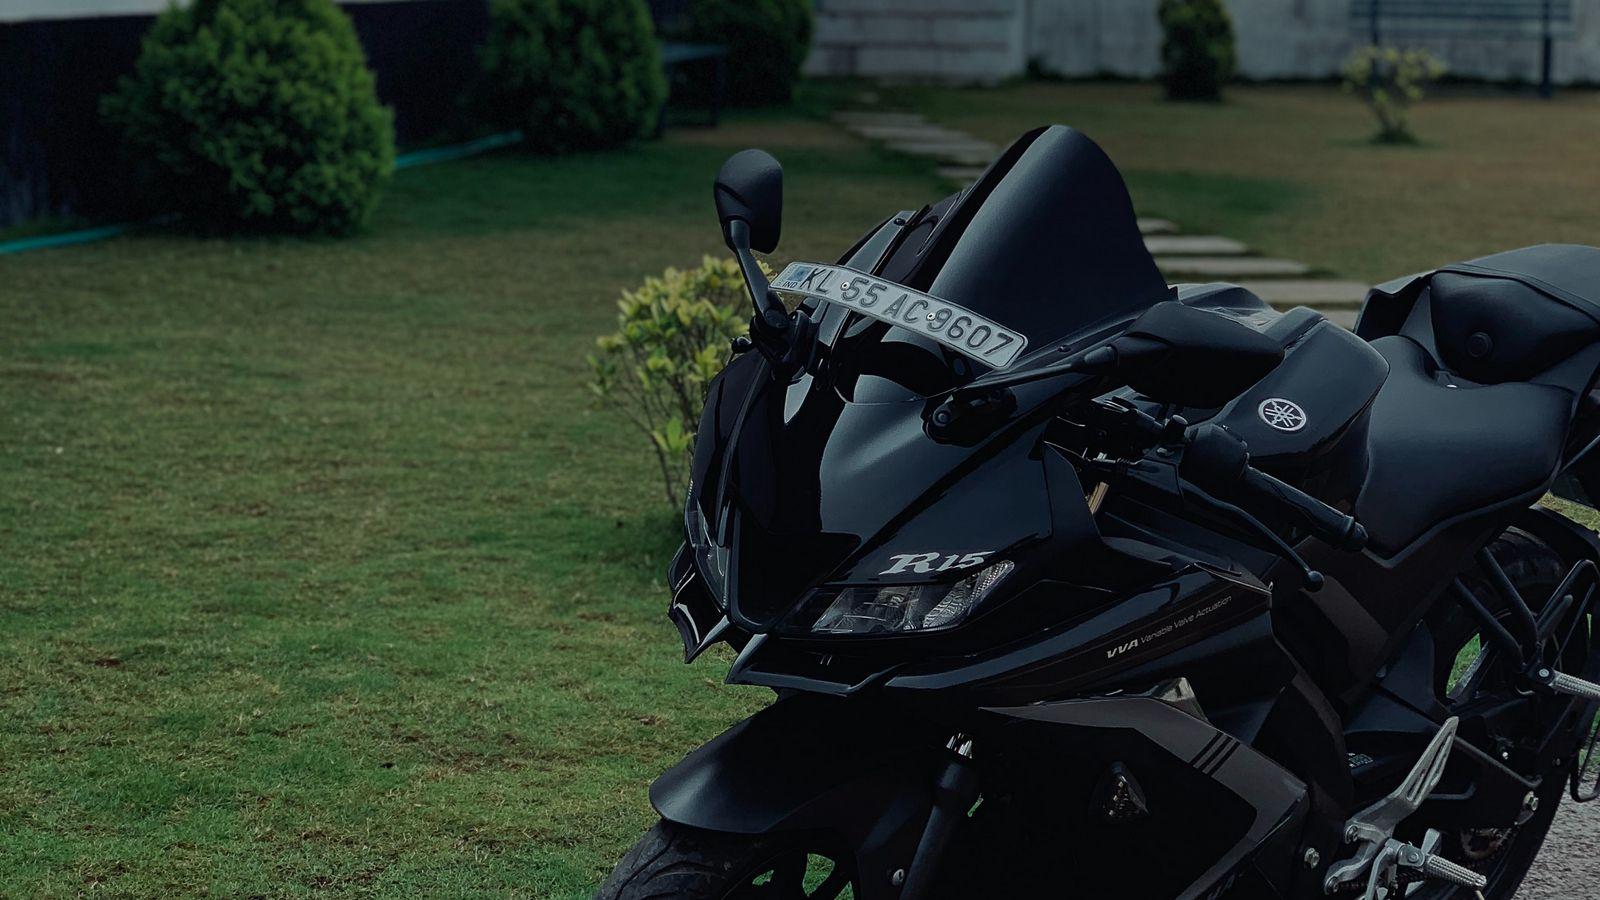 1600x900 Wallpaper yamaha r15, yamaha, motorcycle, bike, black